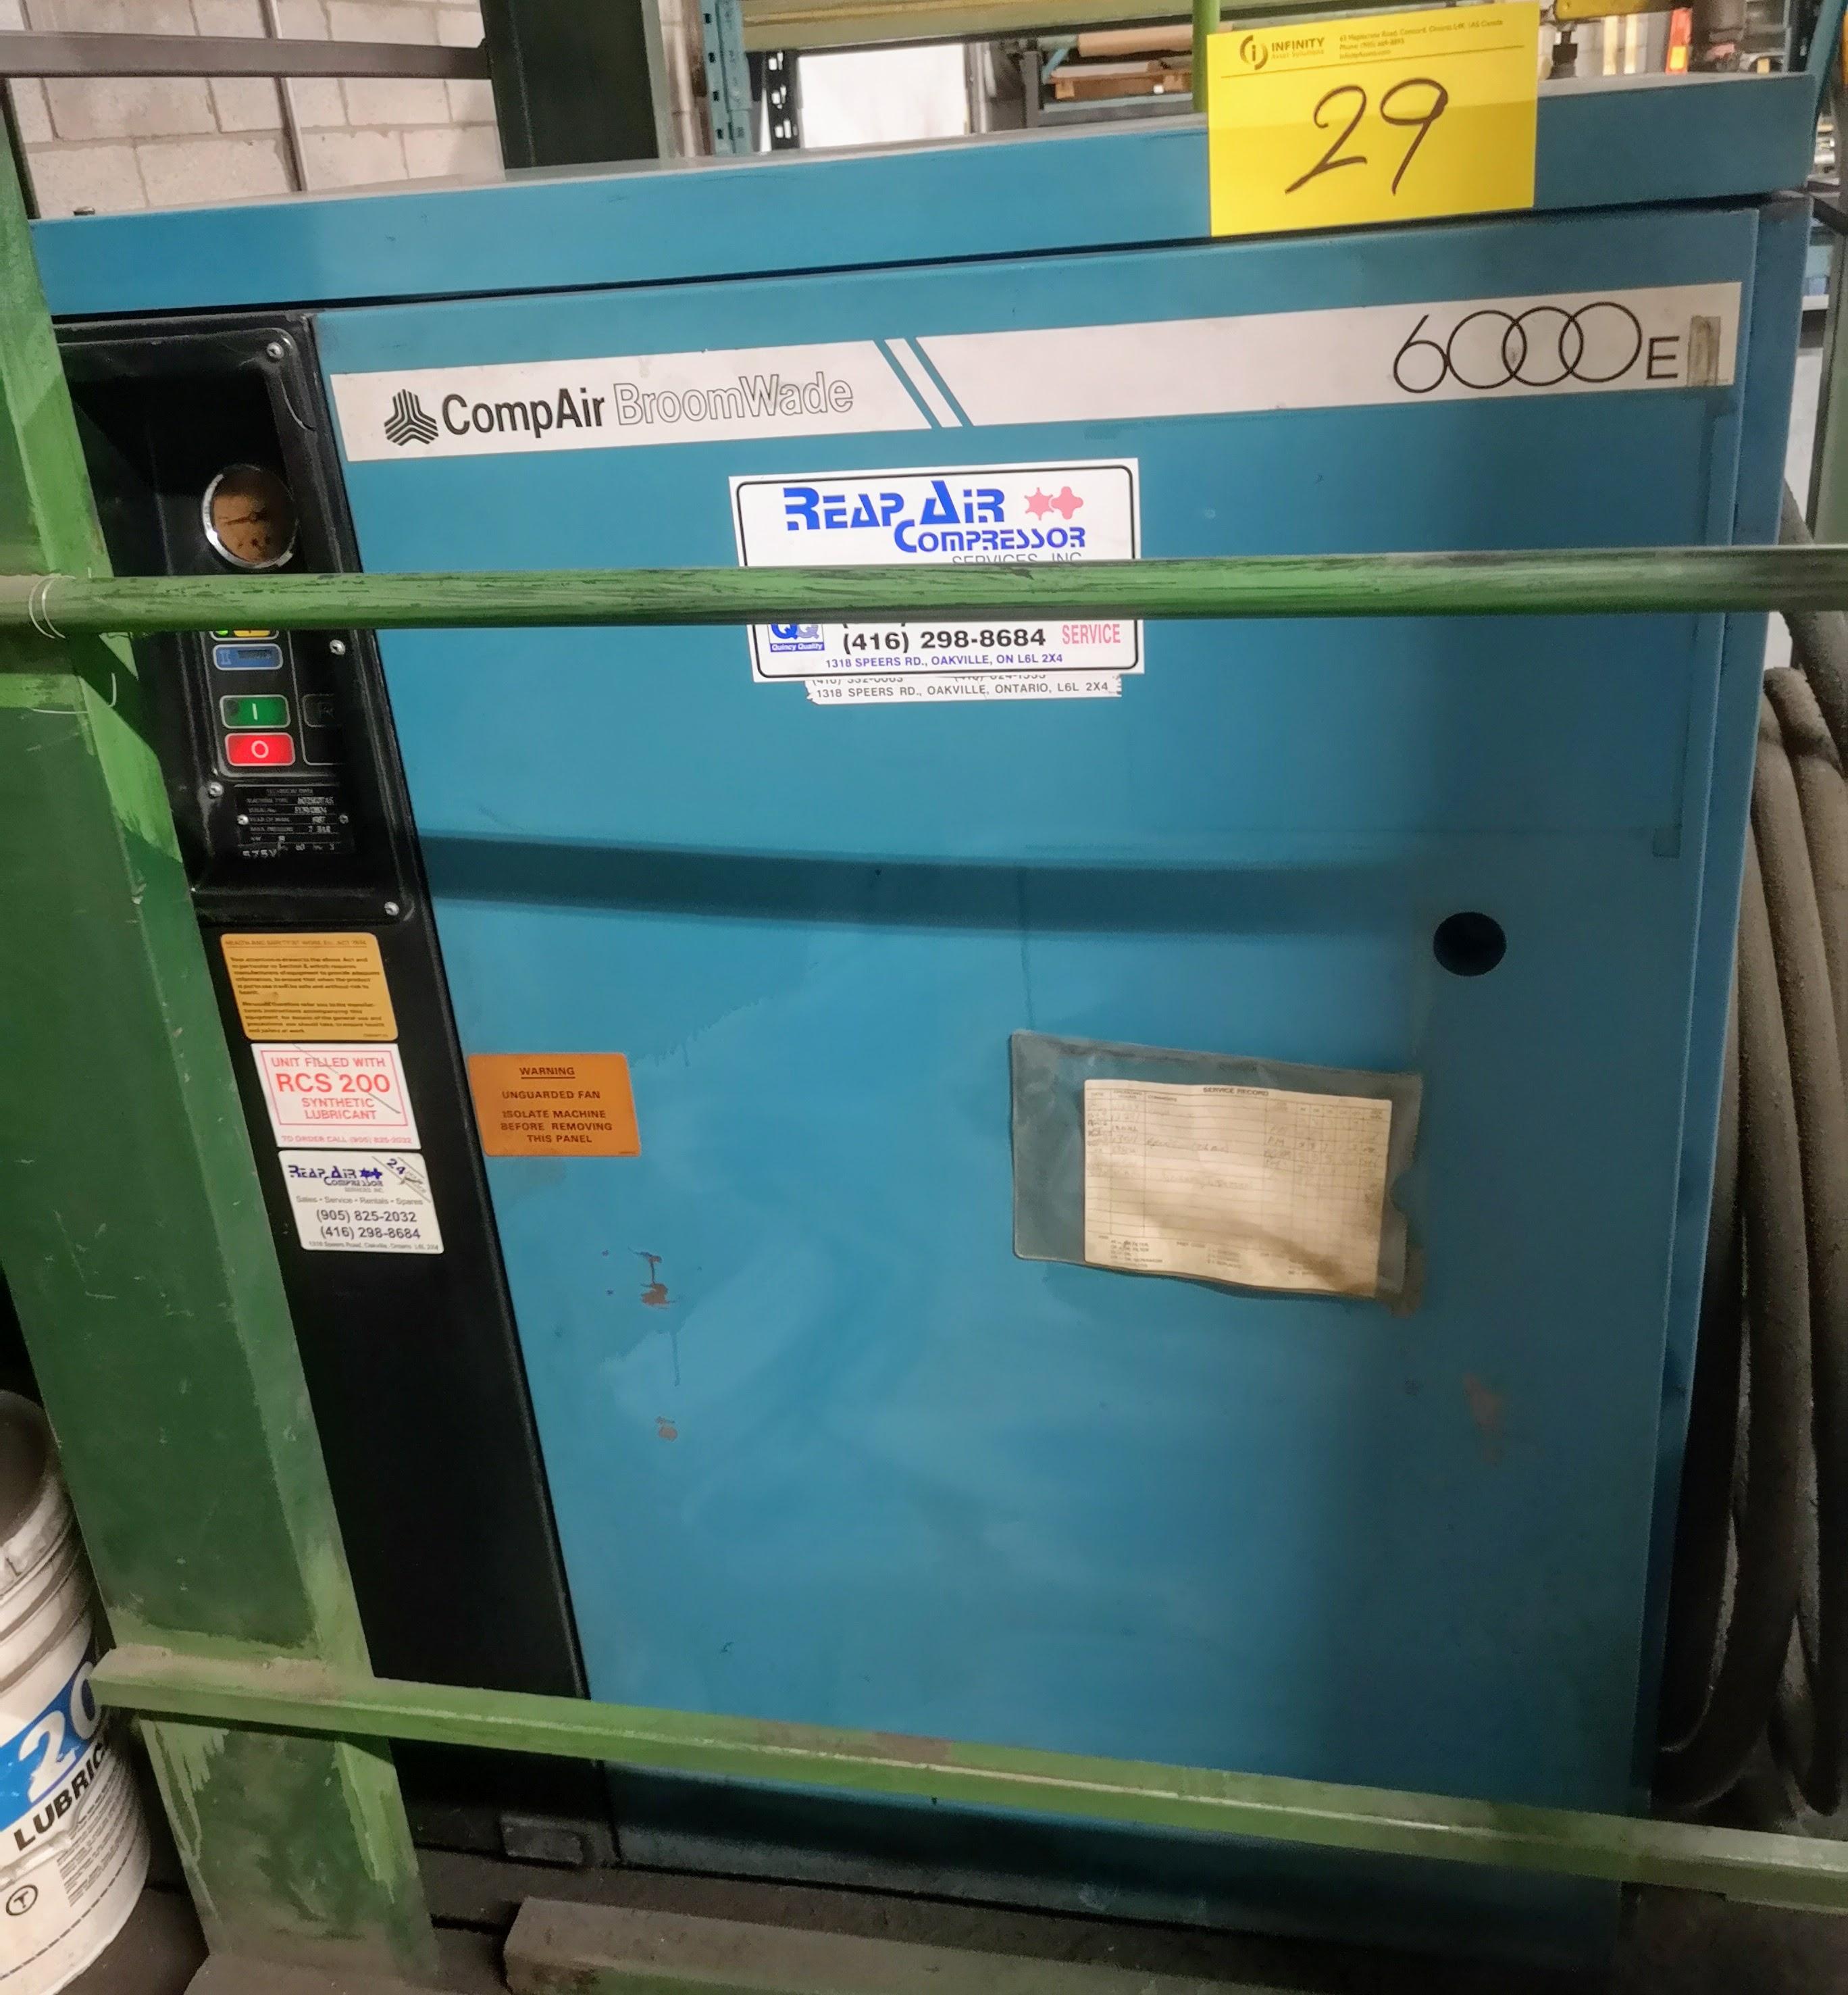 Lot 29 - COMPAIR 6000E SCREW AIR COMPRESSOR, 25HP, 19,029HRS